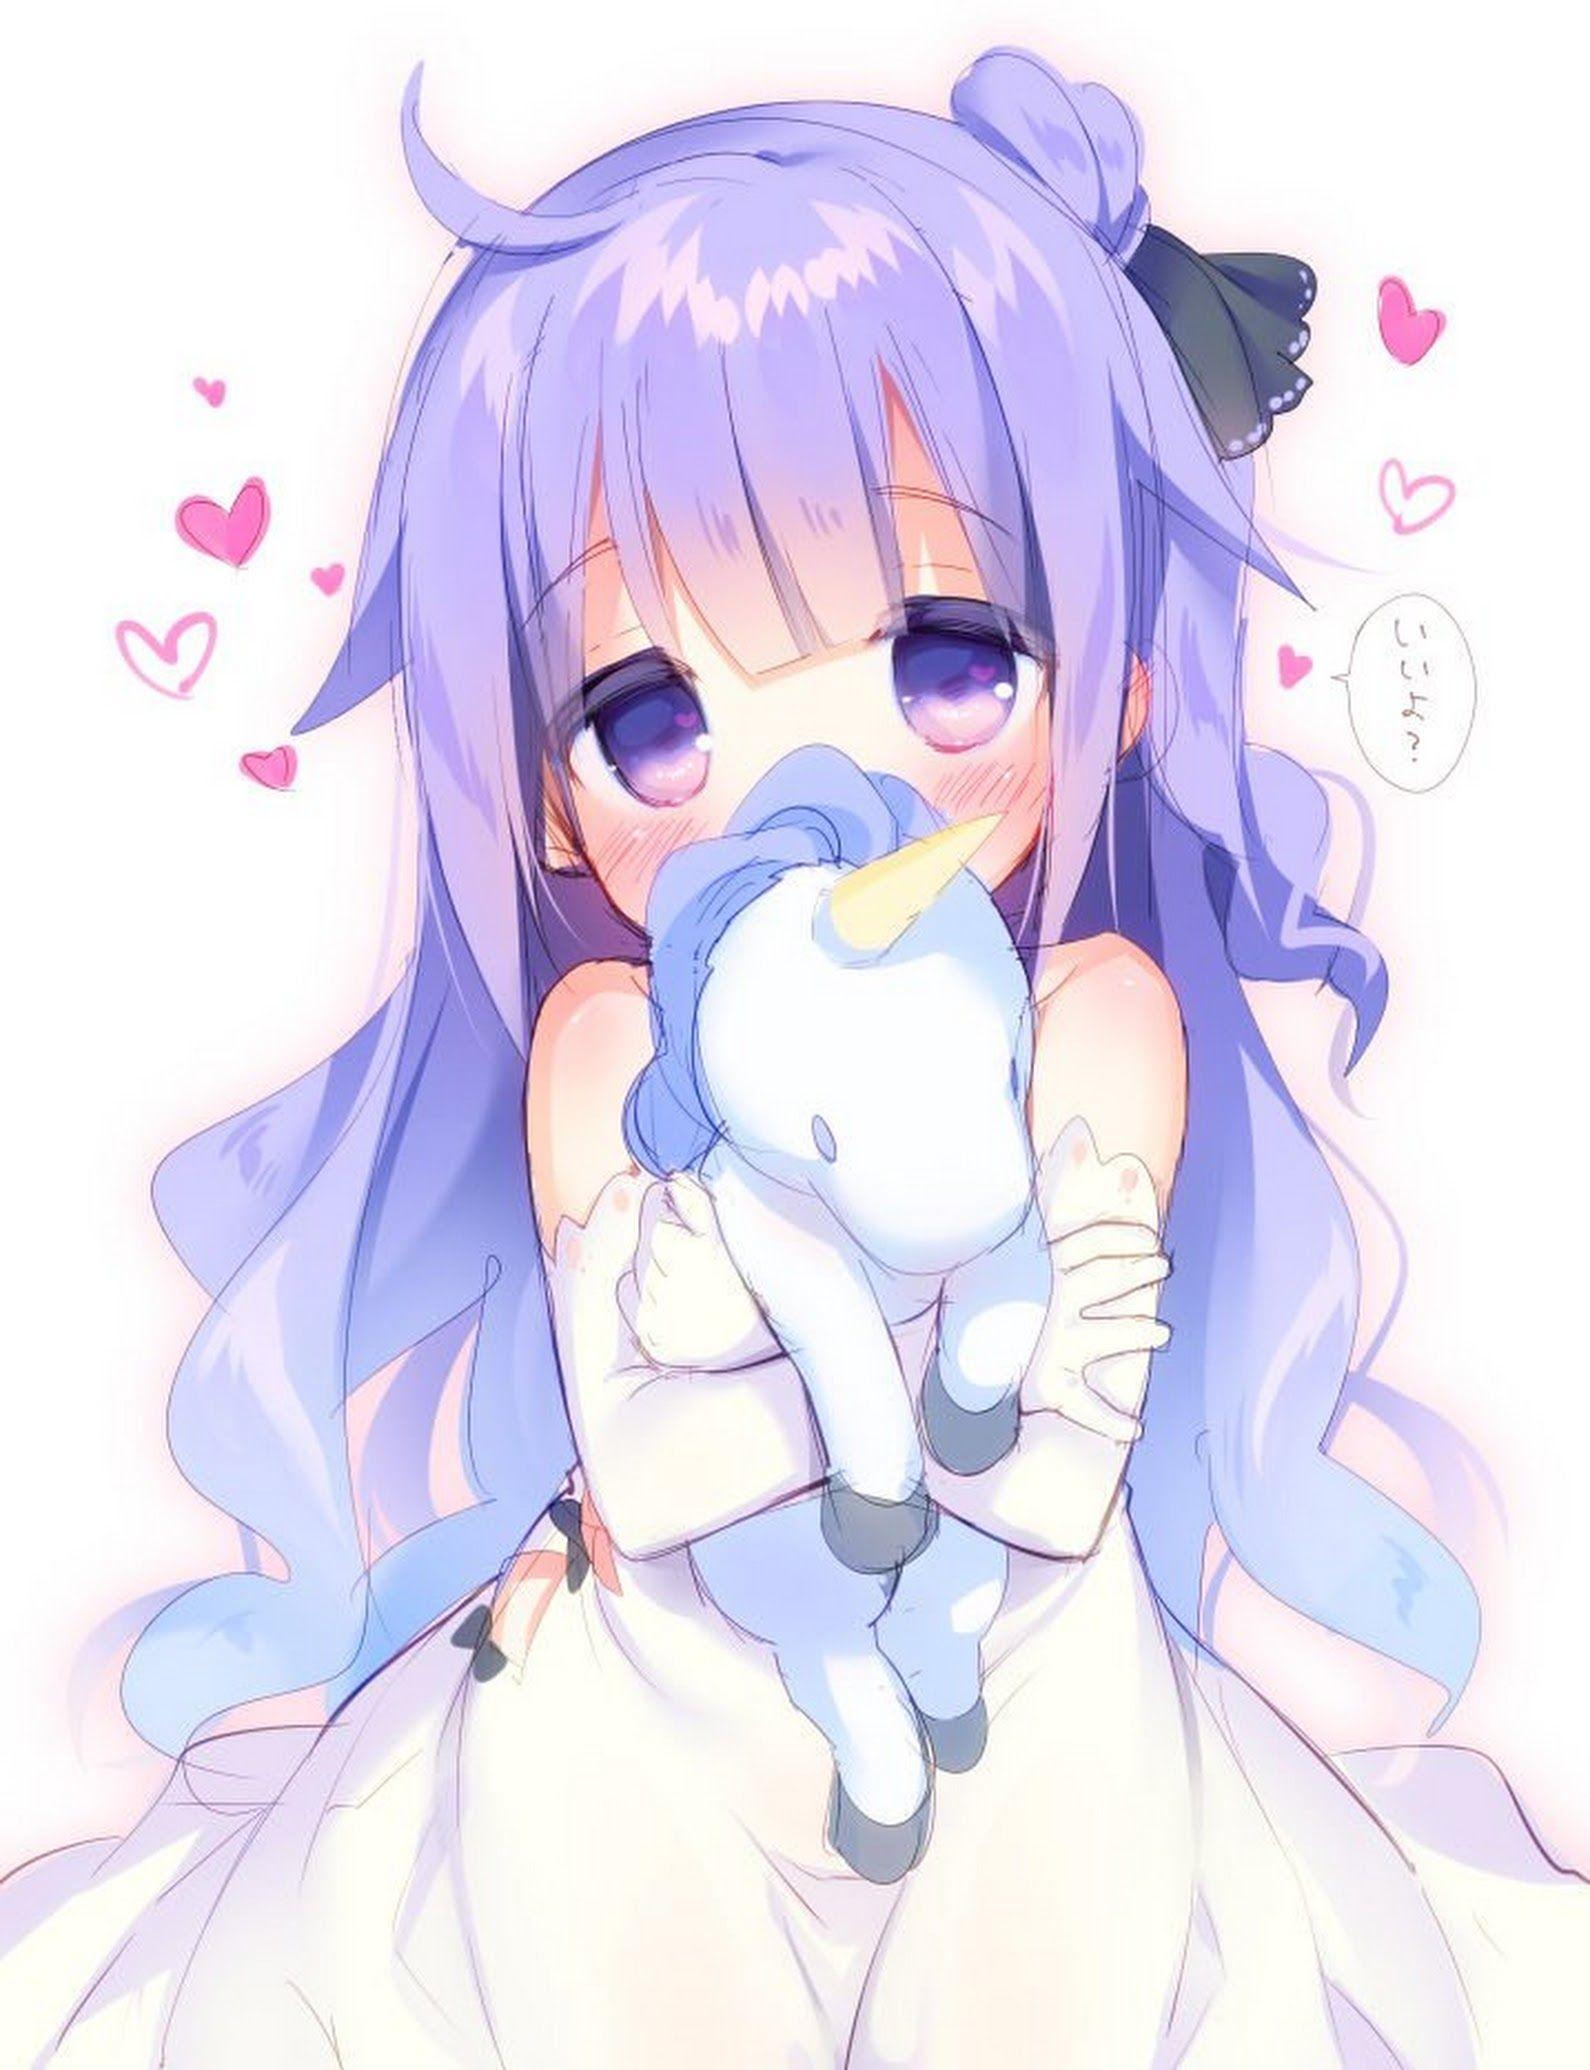 pinalena miana on anime/manga | pinterest | anime, kawaii and manga